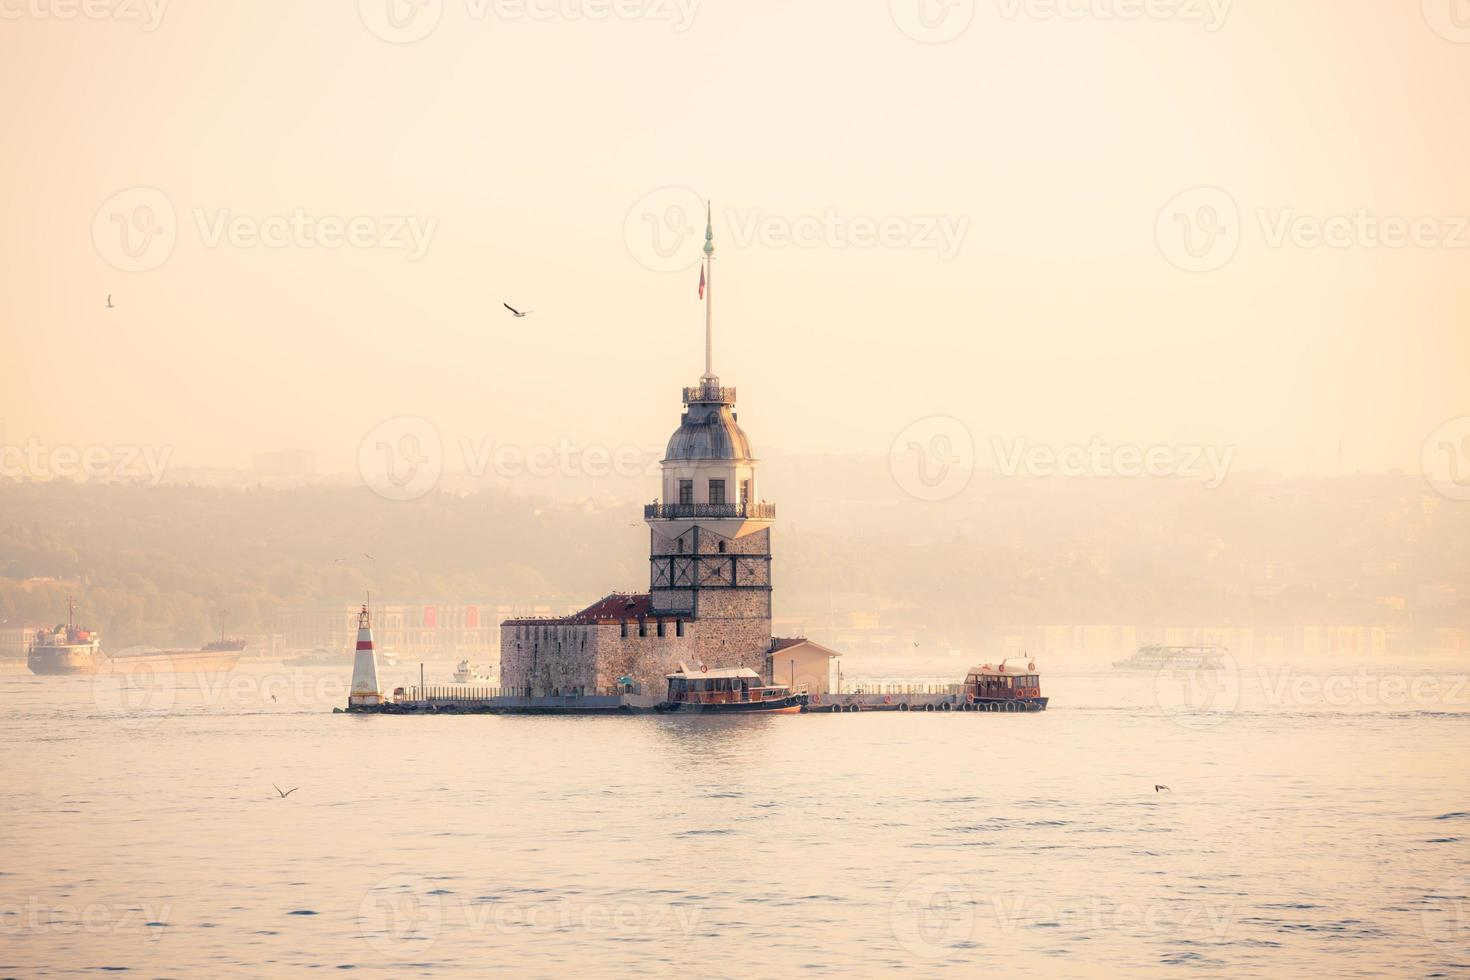 torre da donzela (kiz kulesi) na manhã ensolarada foto